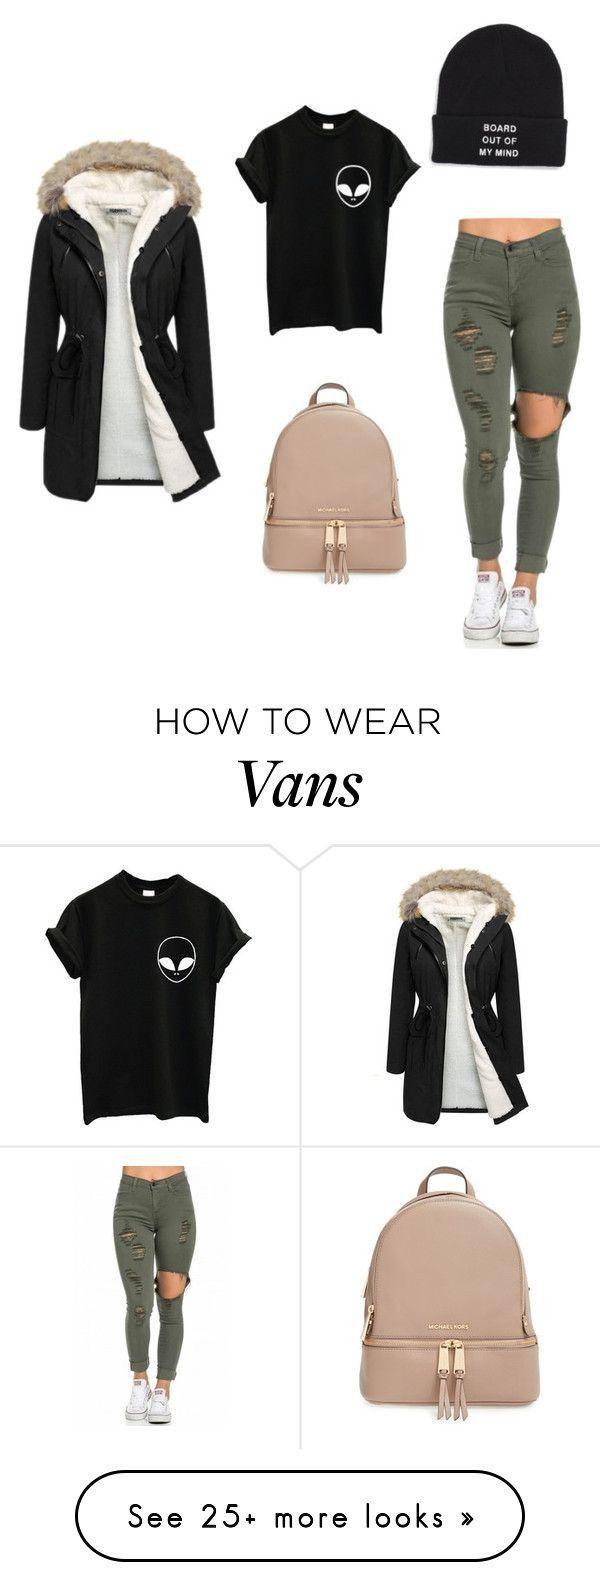 Outfits para chicas, ideas para vestirte y sentirte mas cómoda con tigo  misma SÍGUEME ♡♡